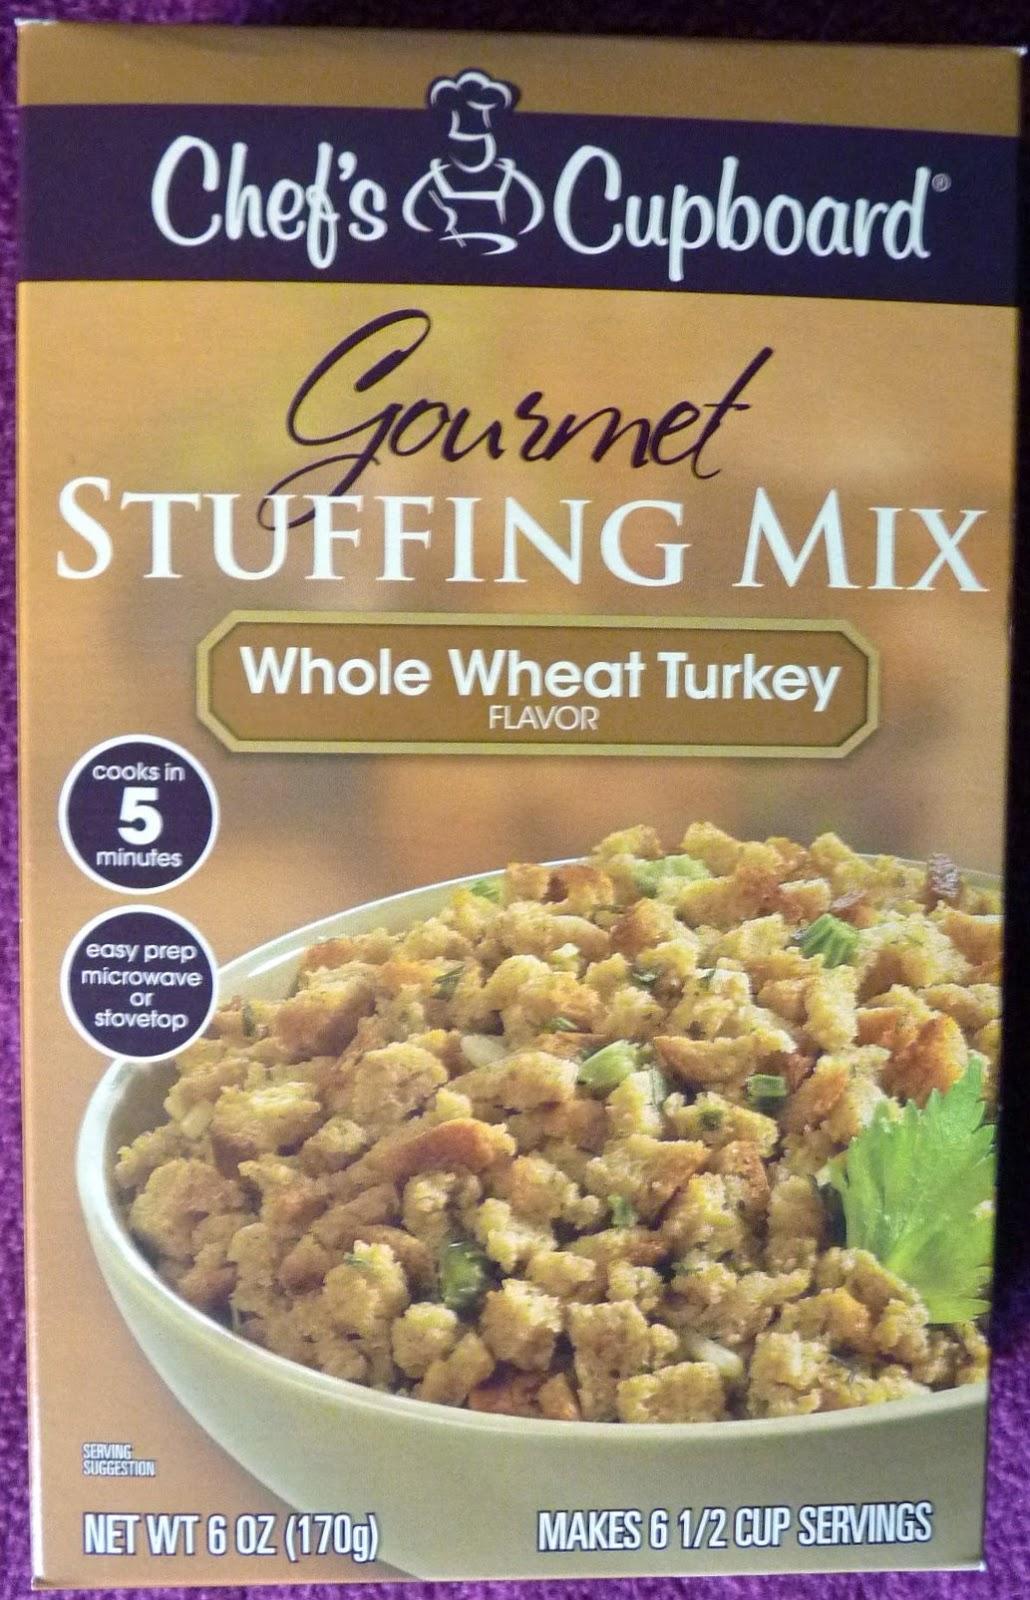 Chef's Cupboard Whole Wheat Turkey Stuffing Mix